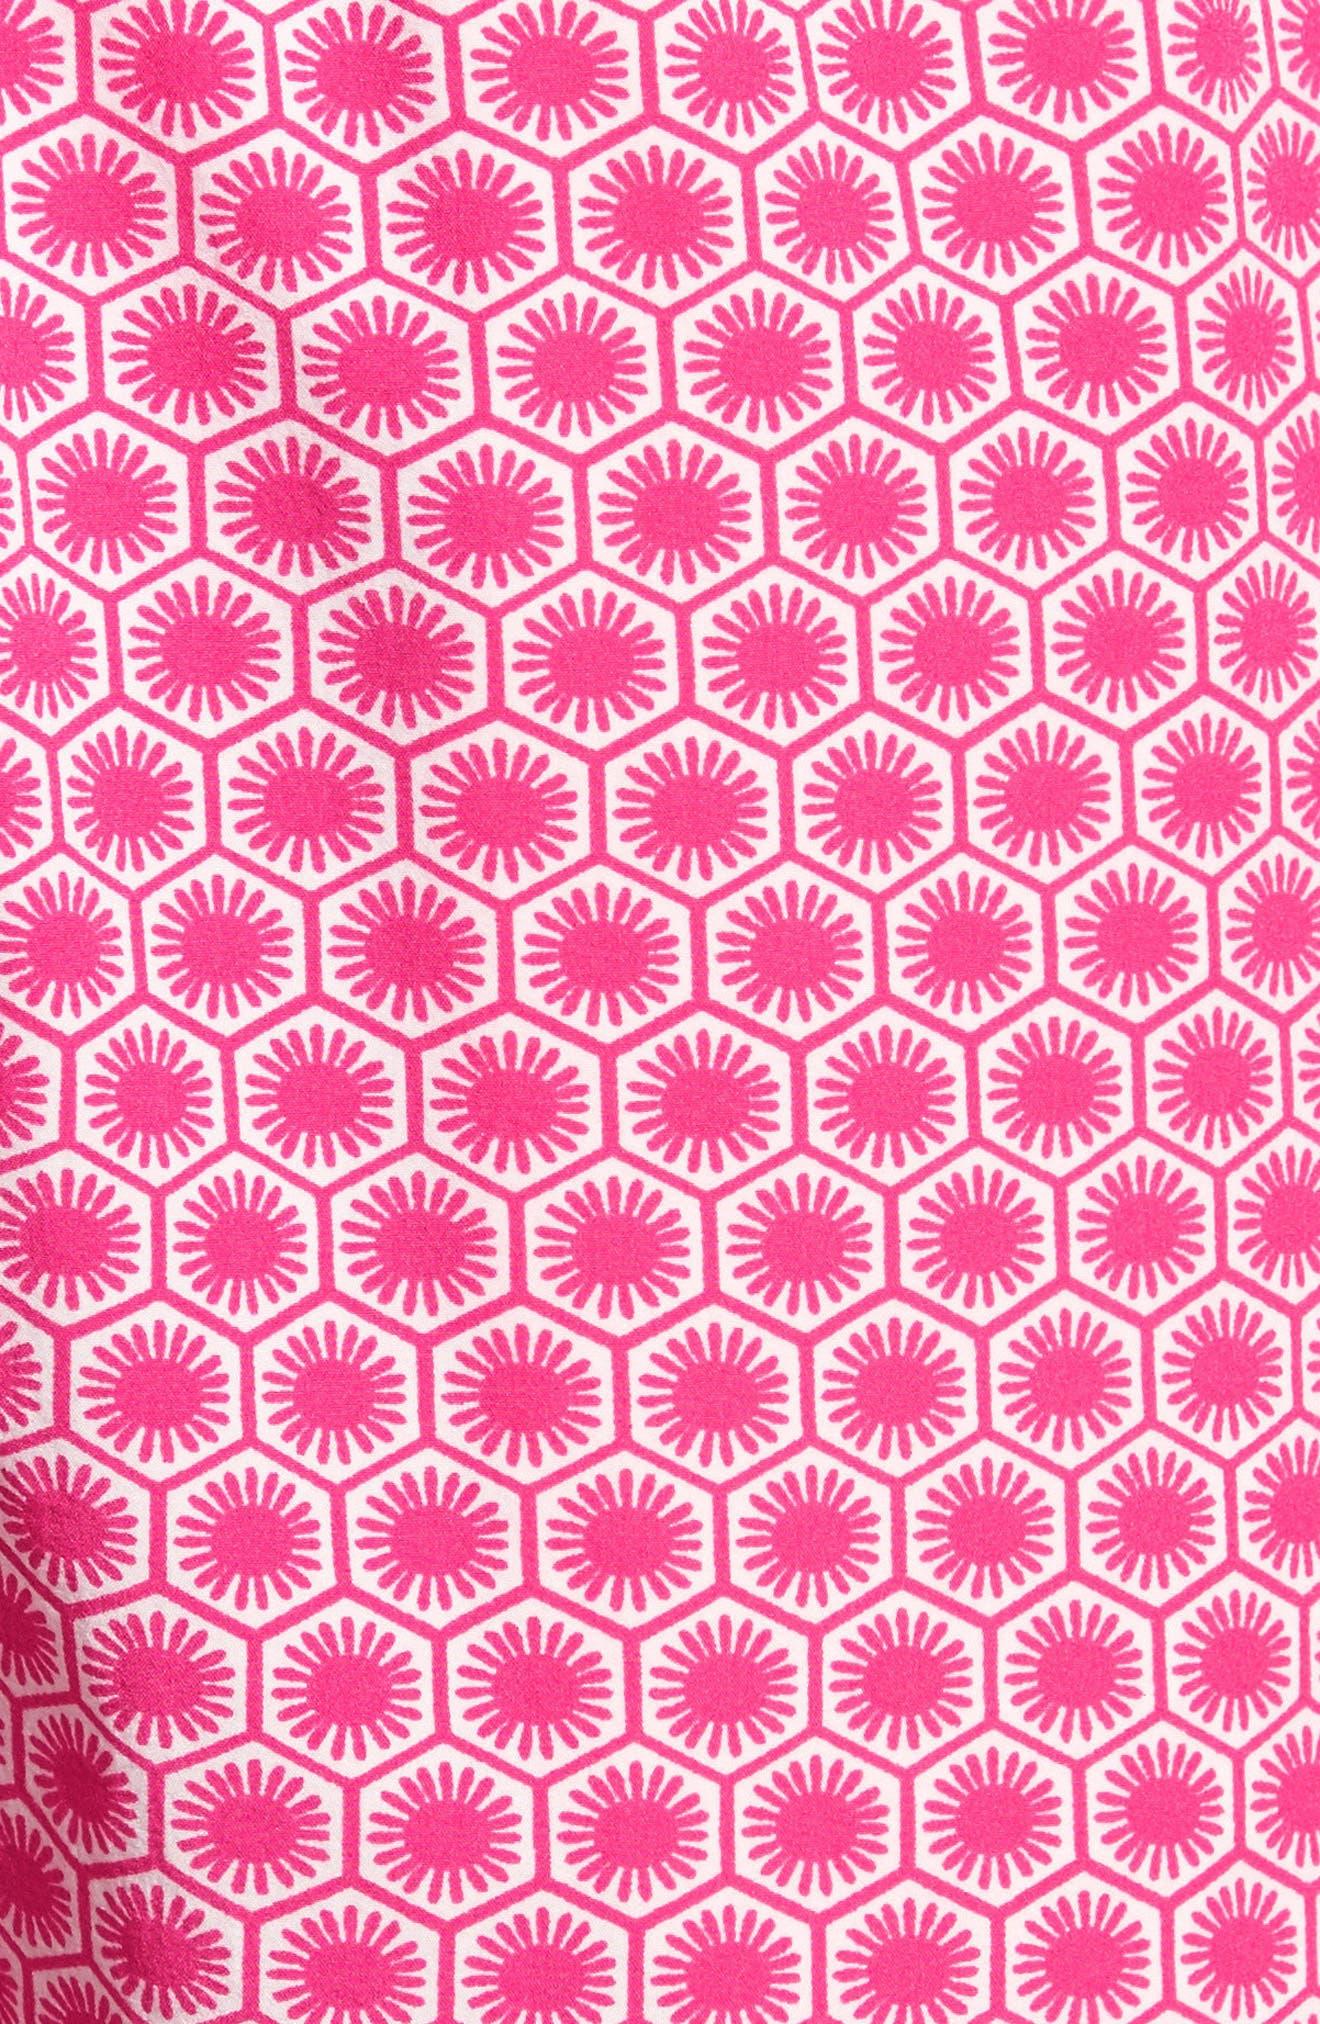 Psycho Bunny Japanese Honeycomb Swim Trunks,                             Alternate thumbnail 5, color,                             Raspberry